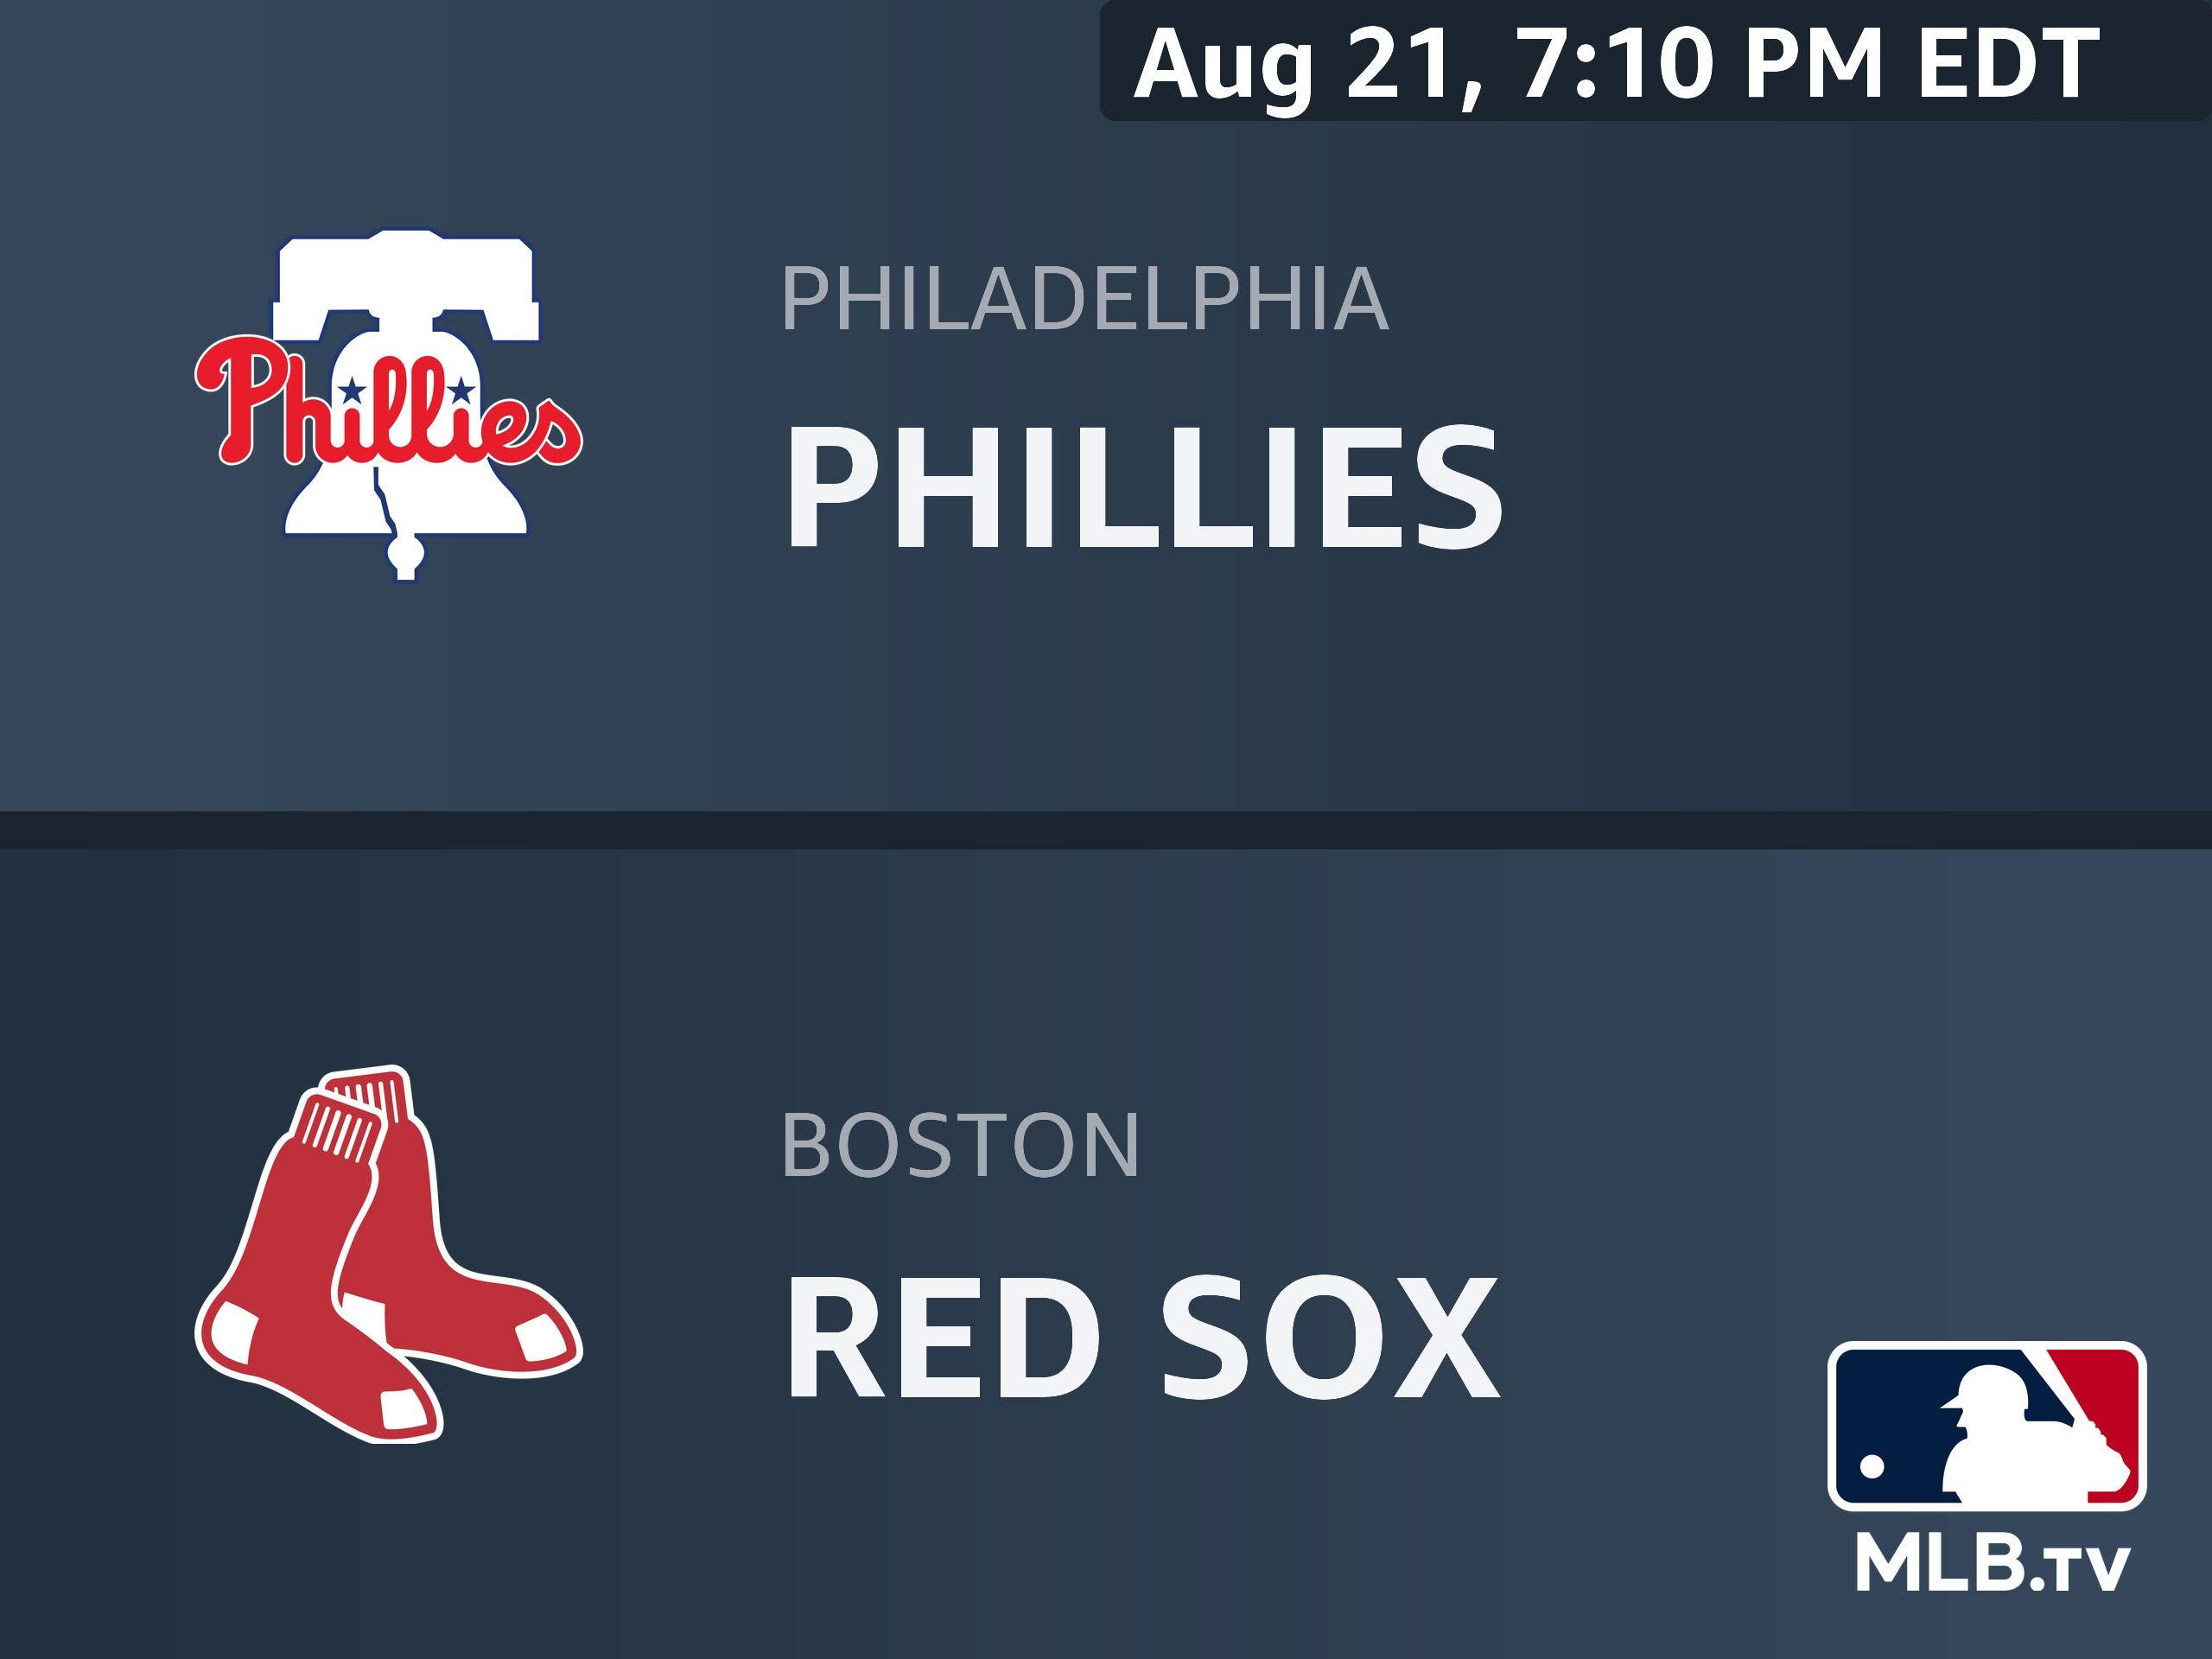 Amazon.com: Philadelphia Phillies at Boston Red Sox